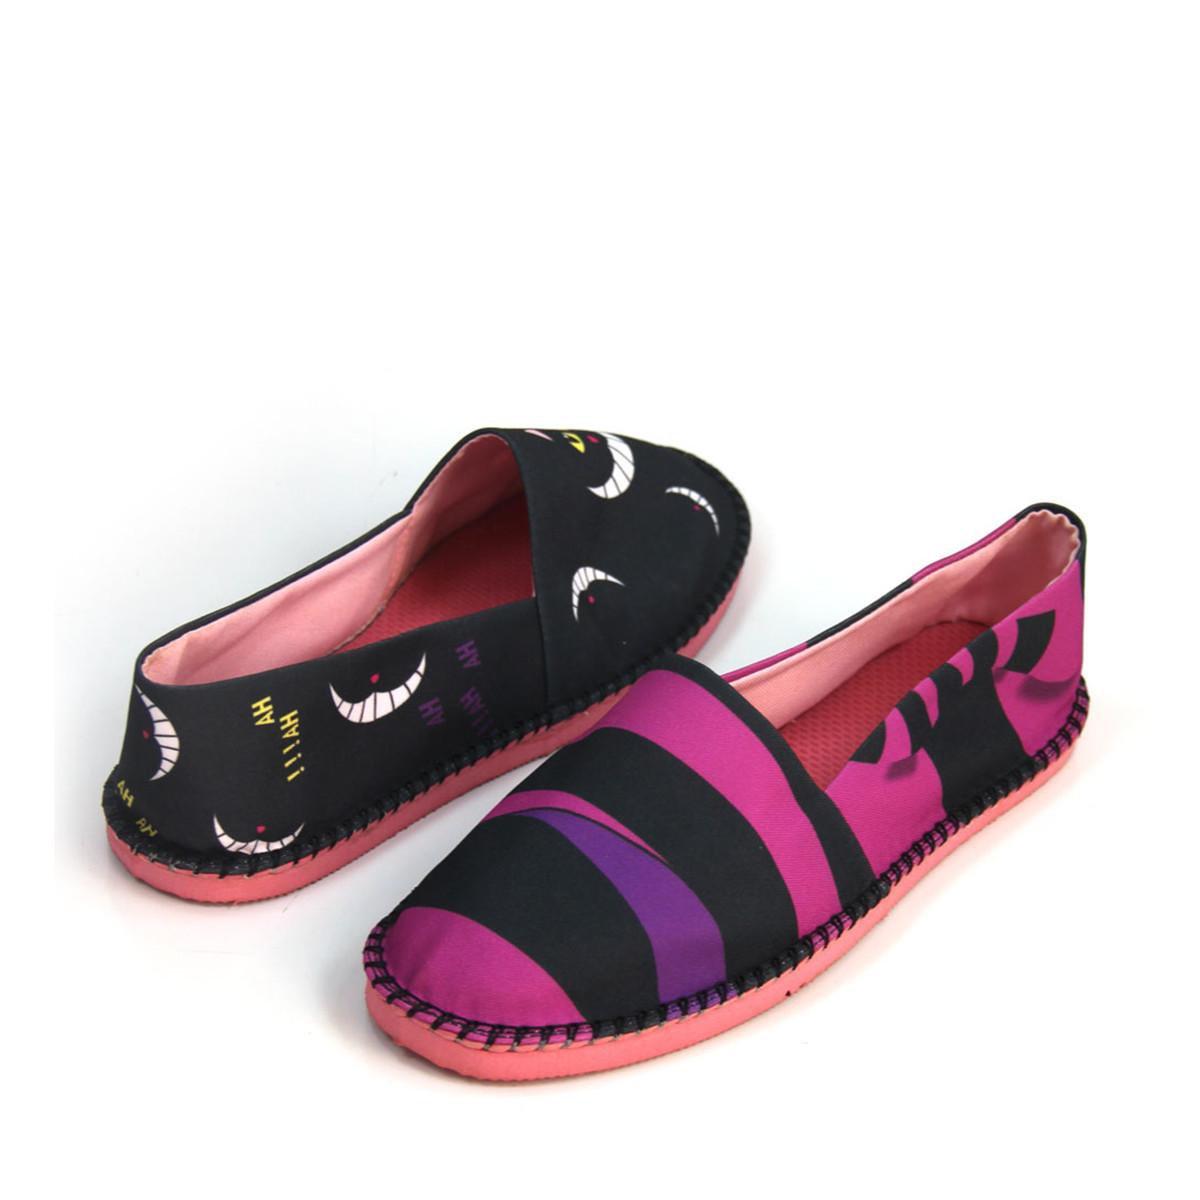 Cupcakes Fresh Shoes Alpargata Alpargata Rosa Cupcakes Preto e 6xnf1znqw